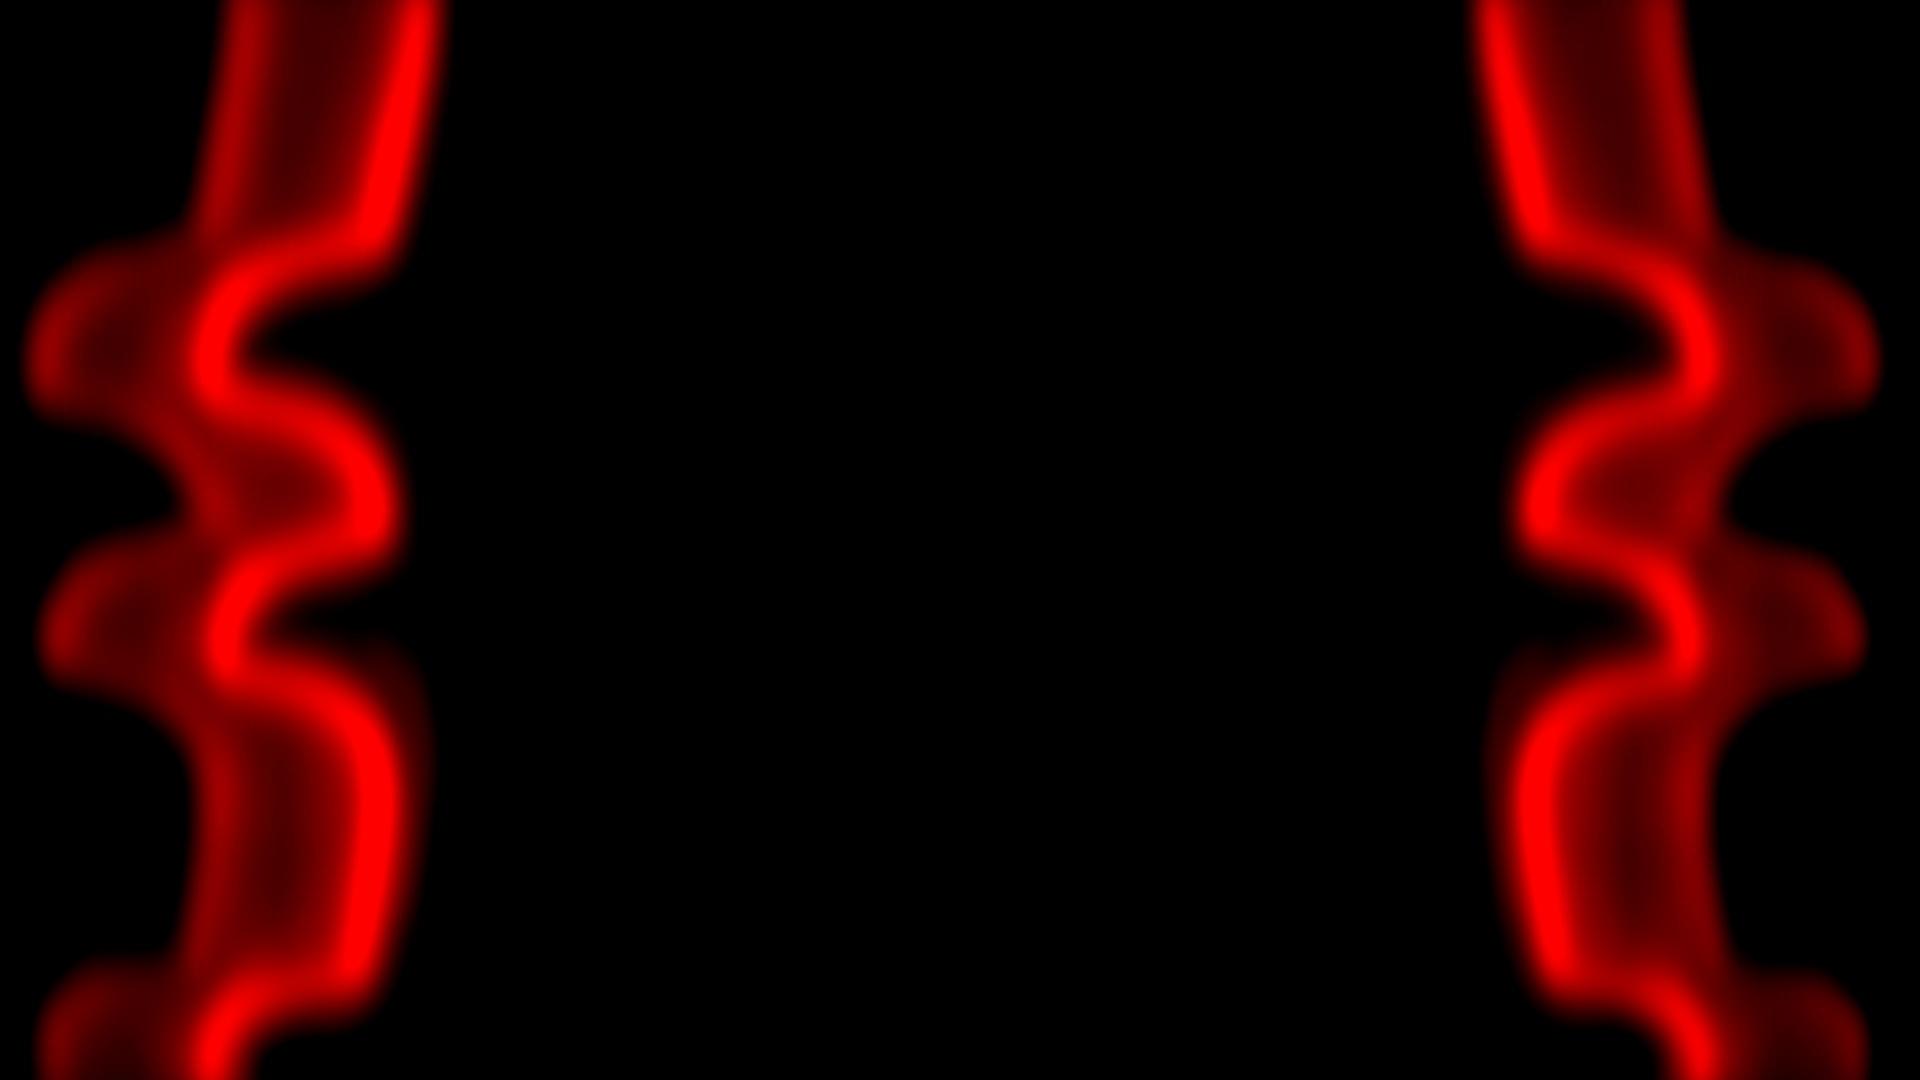 Sorrow - Red Lines Narrow 2